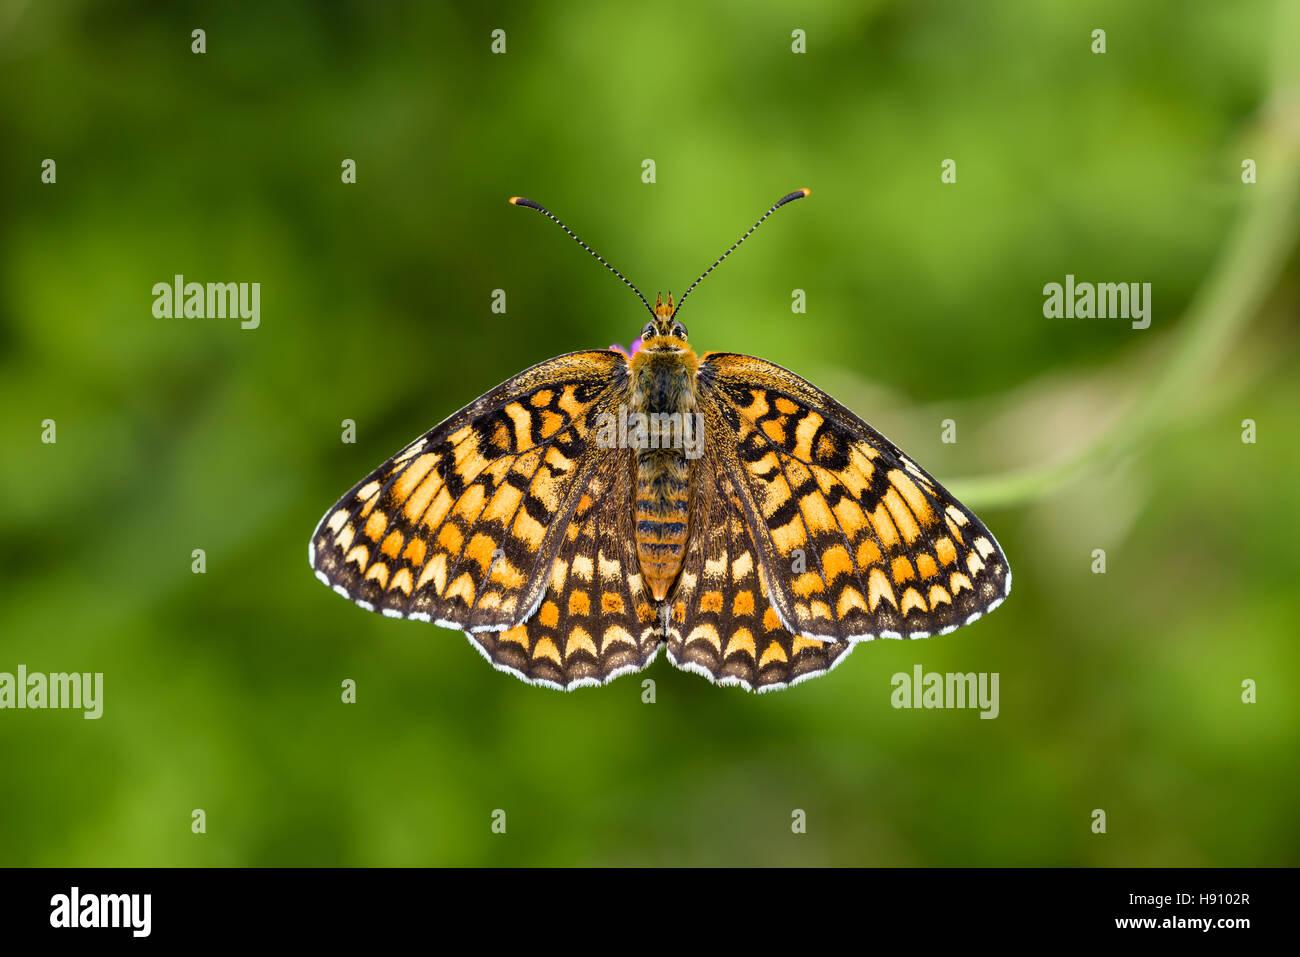 Flockenblumen Scheckenfalter, Melitaea phoebe, Mala Hierba Speyeria Butterfly Imagen De Stock